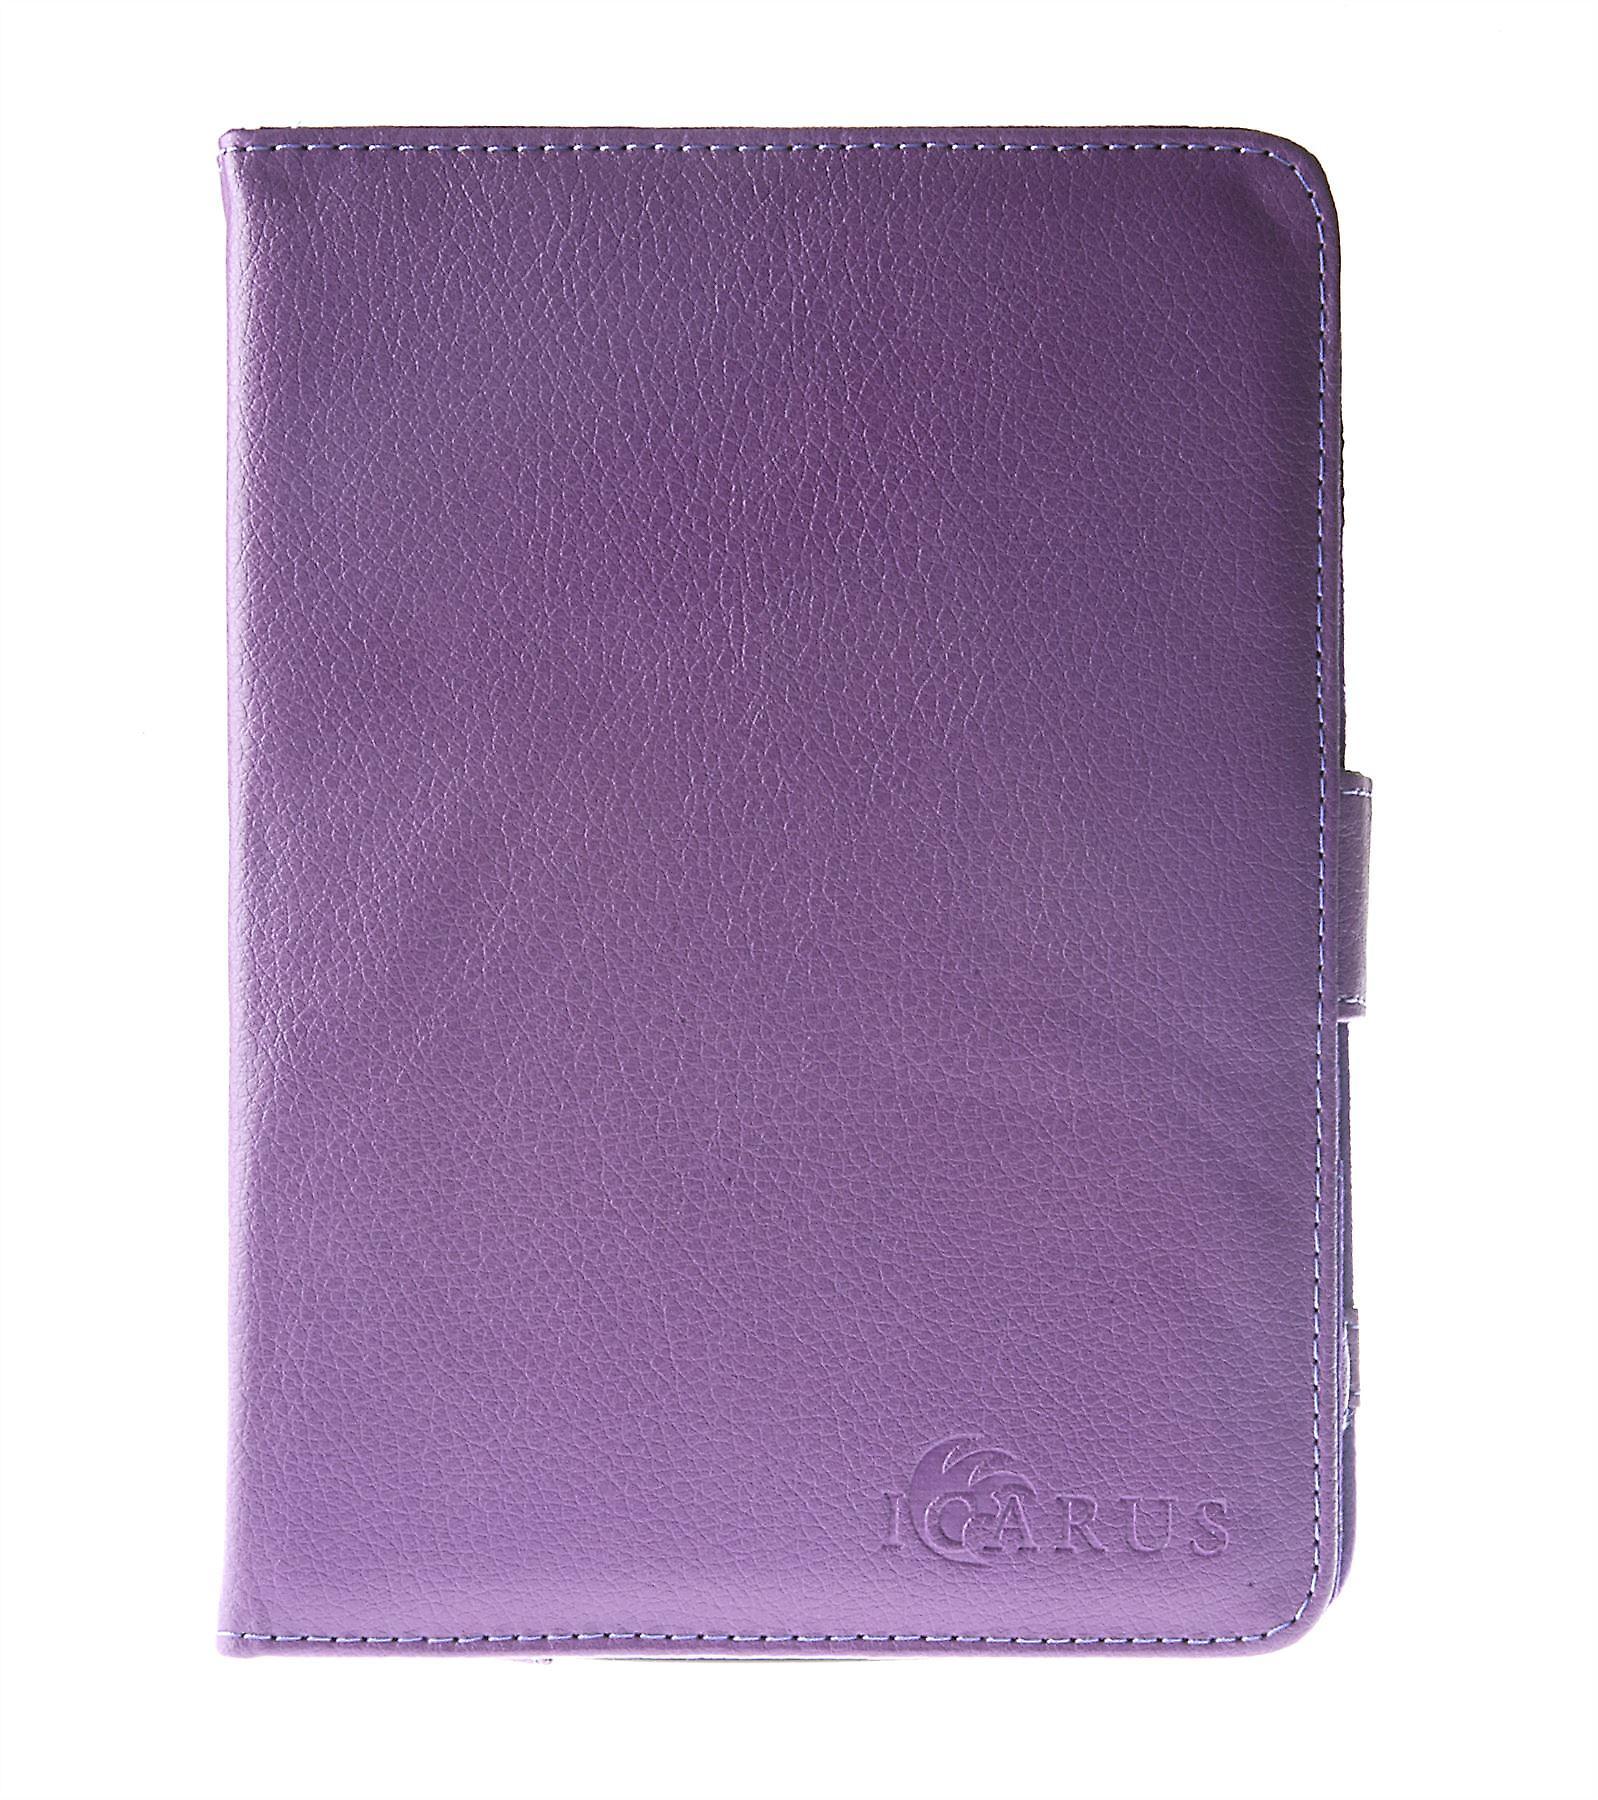 ICARUS Abdeckung lila für Illumina HD / Pocket / Sense G2